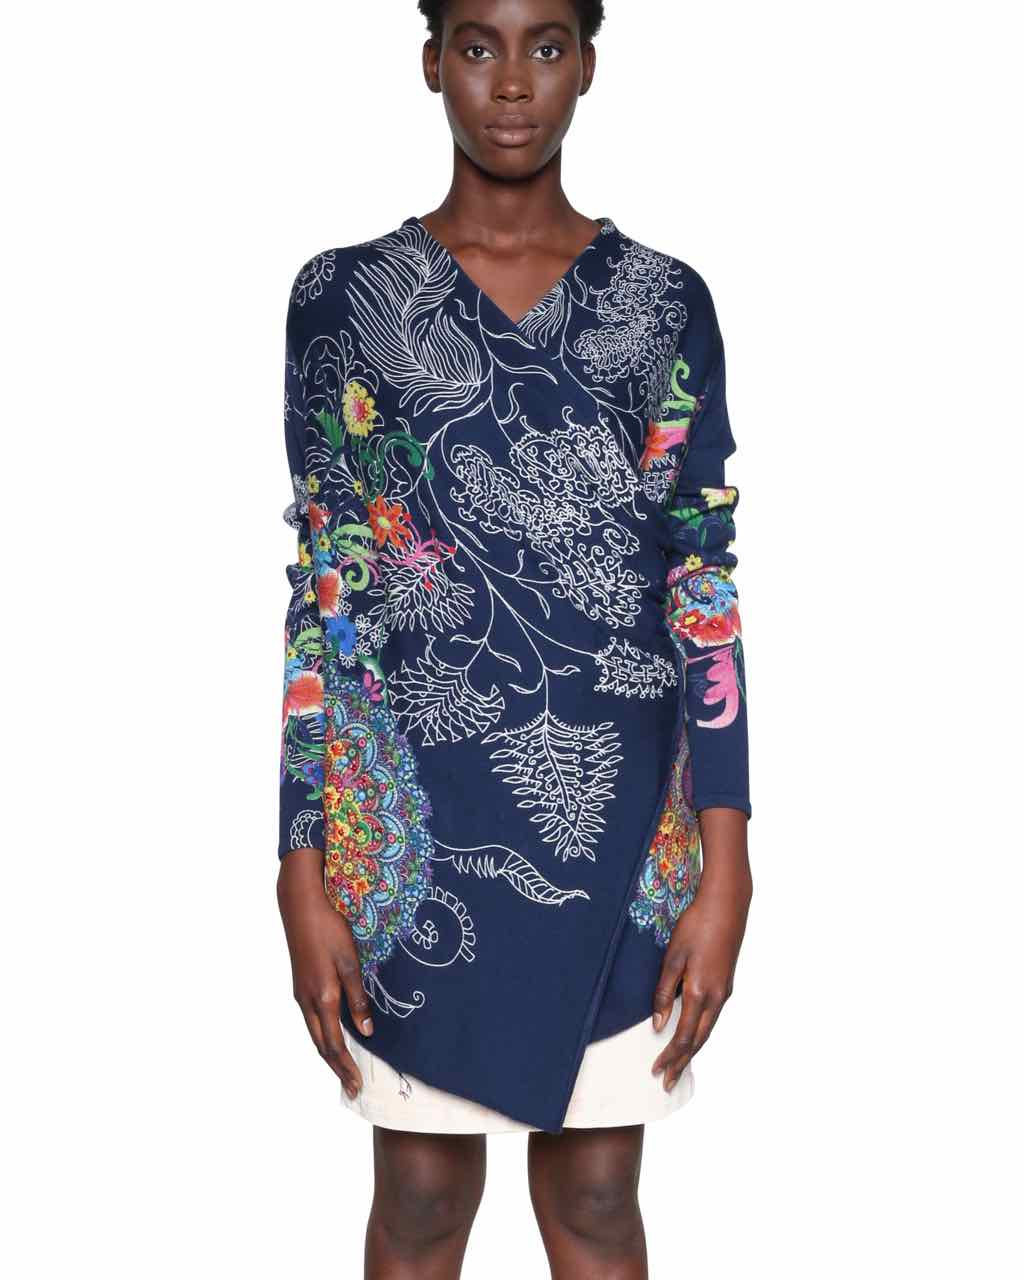 18SWJFB4_5010 Desigual Cardigan Sweater Chrys Buy Online